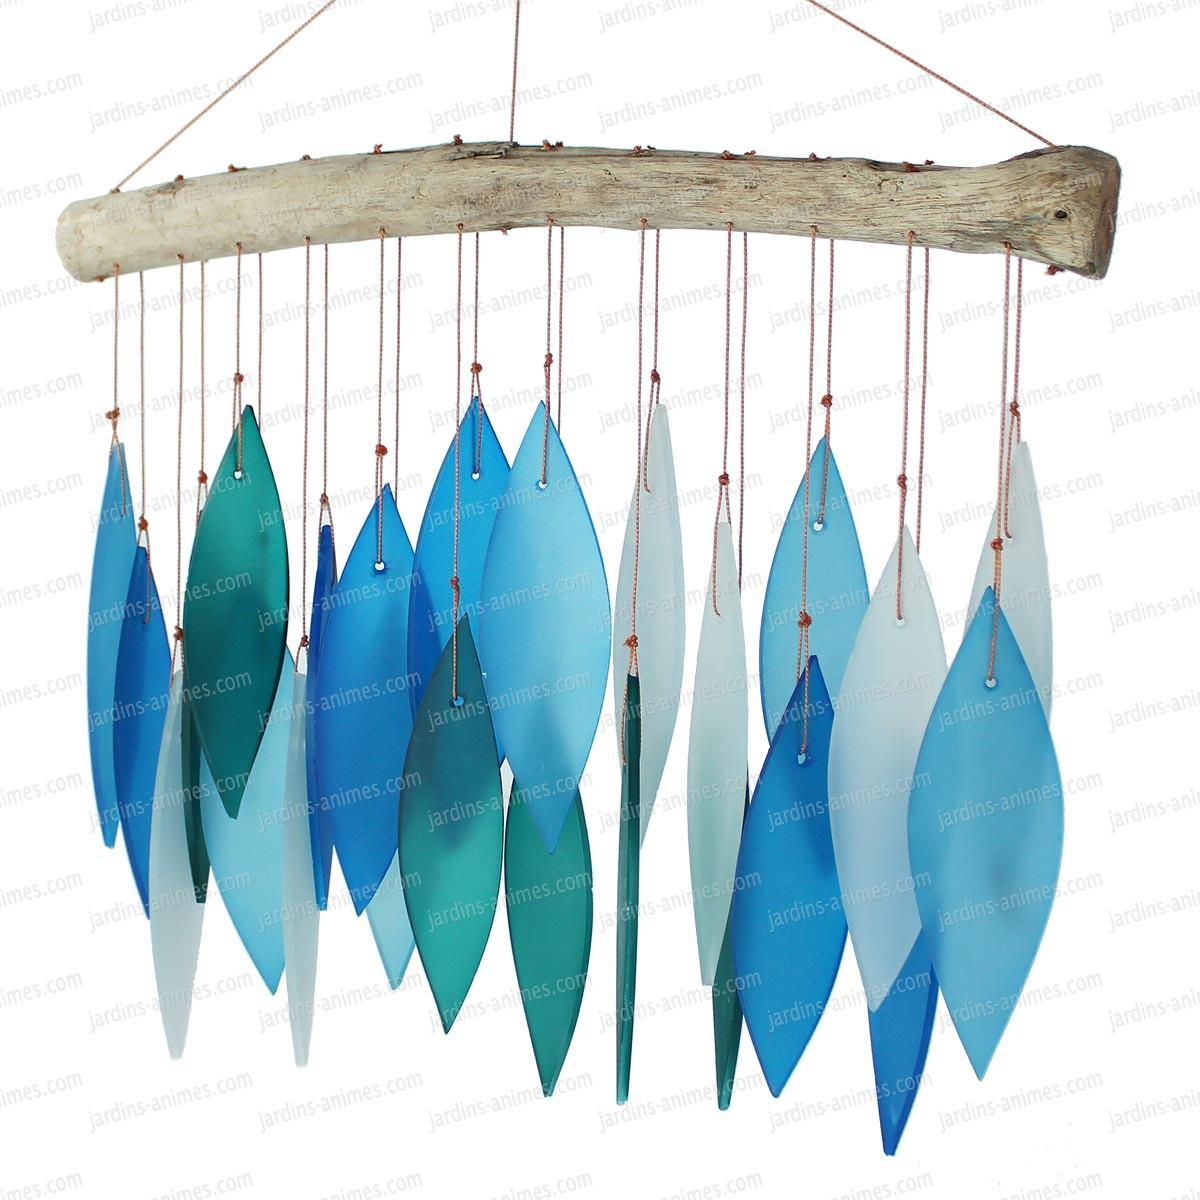 carillon verre et bois bleu carillons zen et feng shui. Black Bedroom Furniture Sets. Home Design Ideas